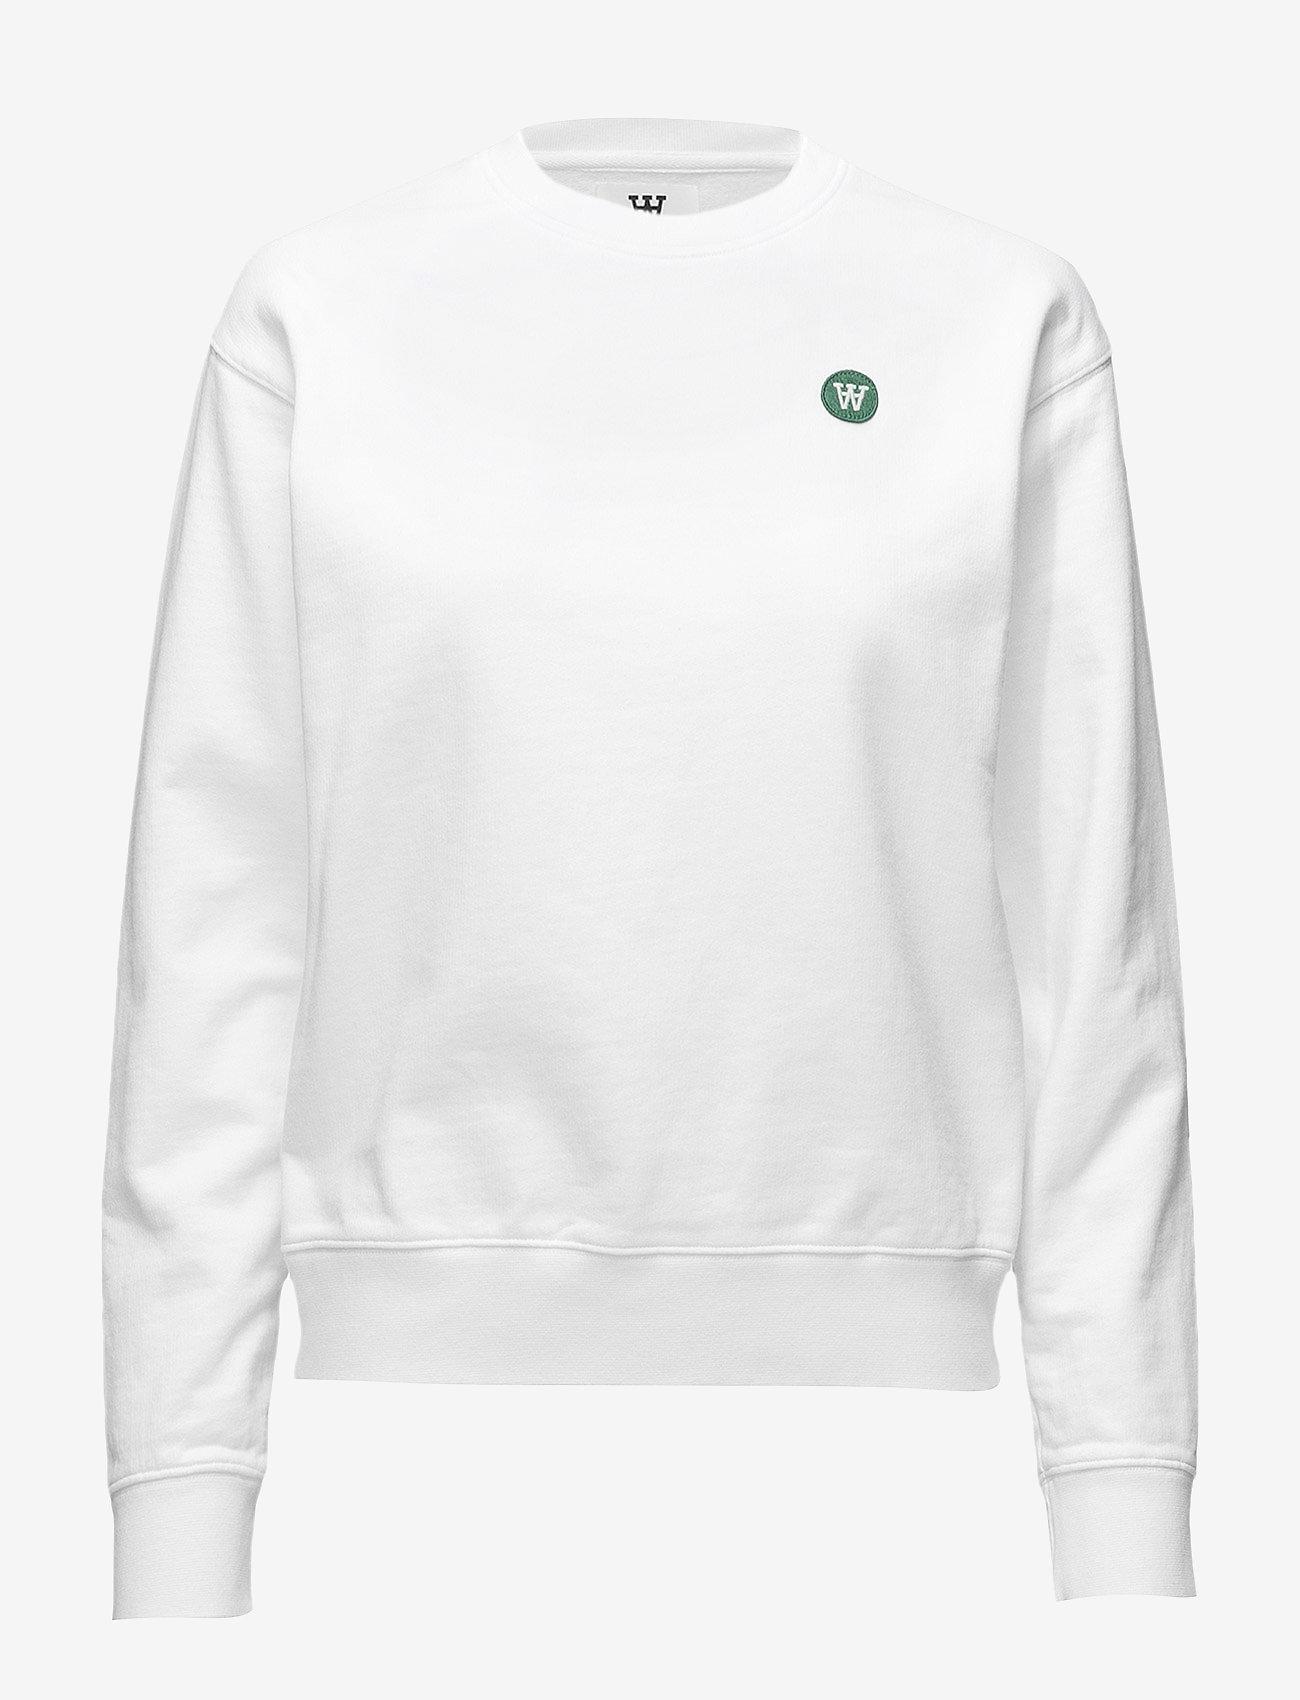 Wood Wood - Jess sweatshirt - sweatshirts - bright white - 0